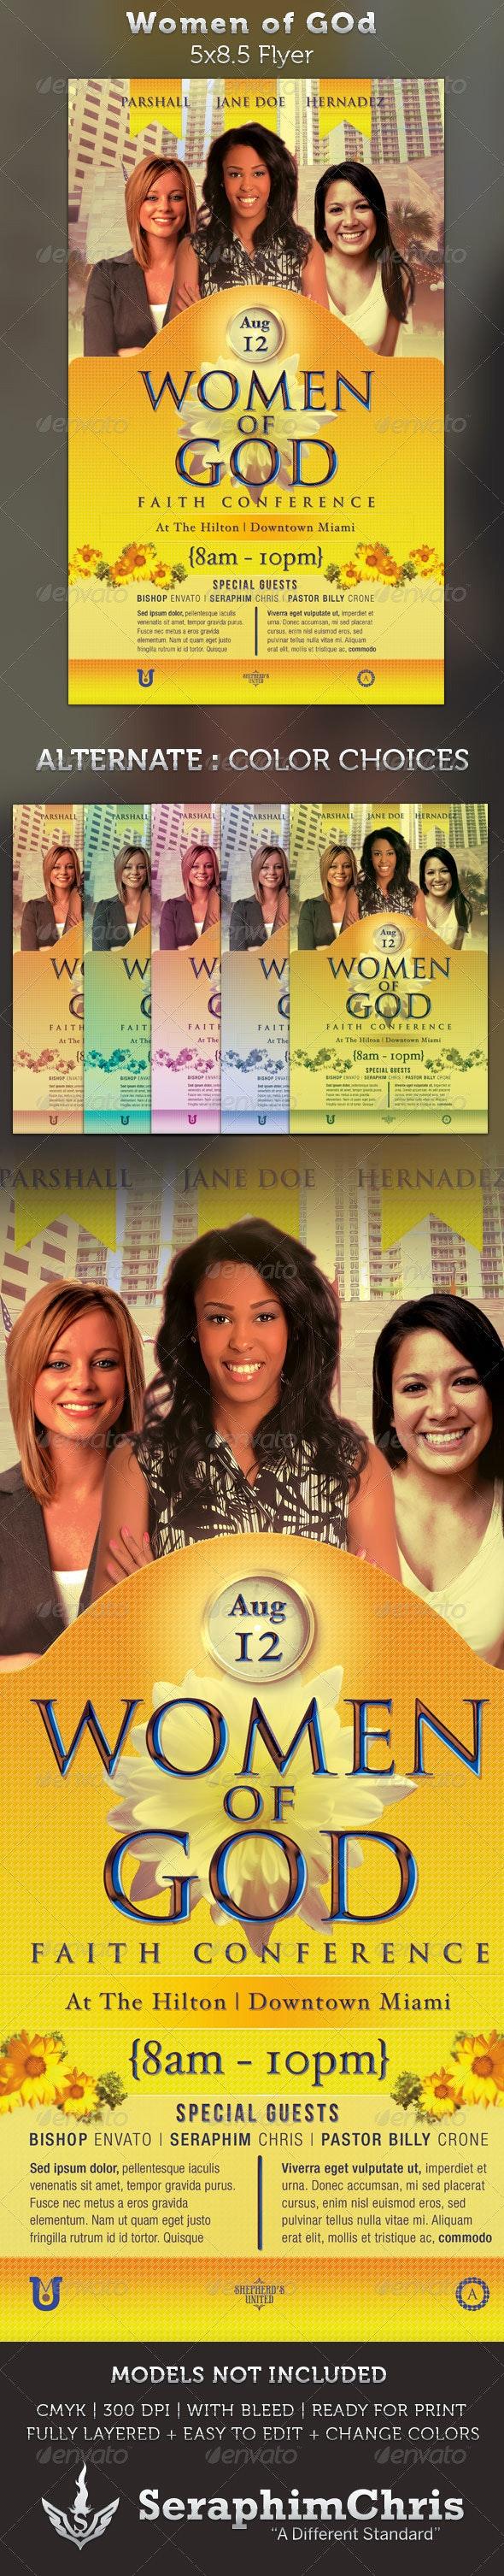 Women of God Faith Conference 5x8.5 Flyer Template - Church Flyers